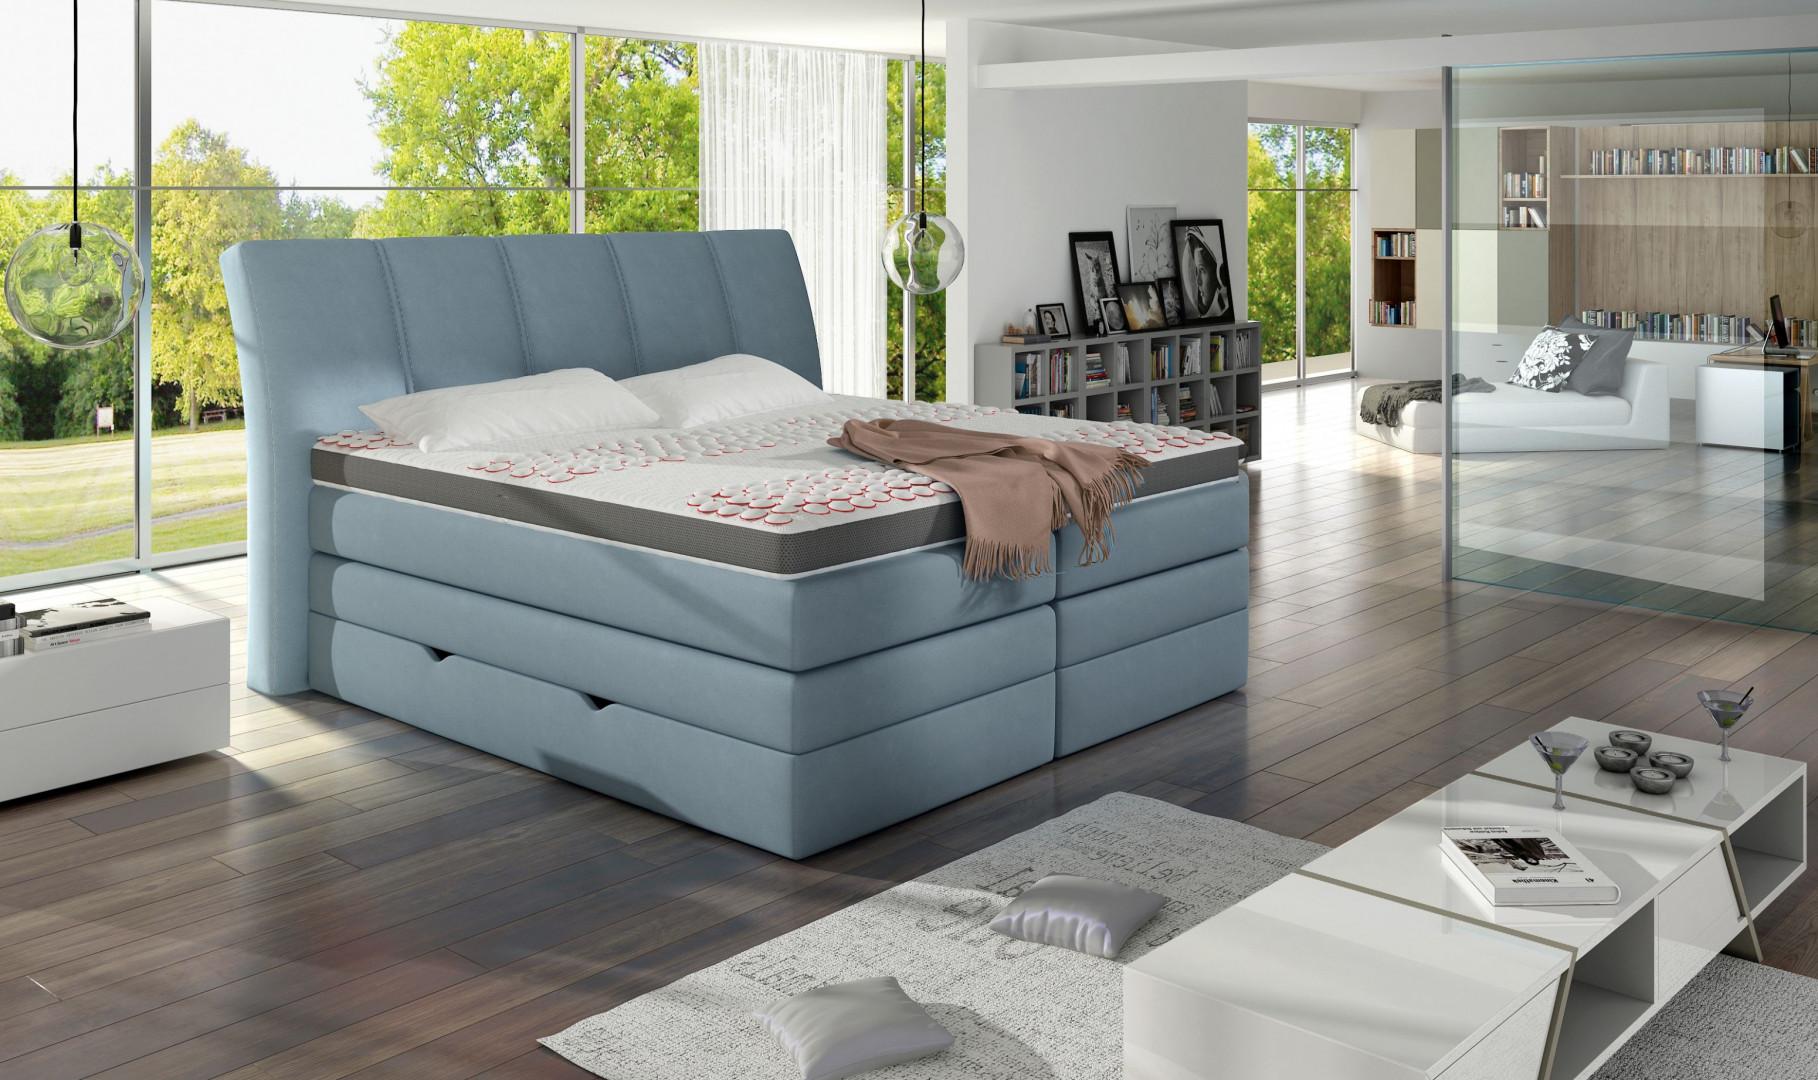 Łóżko kontynentalne Korfu marki Comforteo. Fot. Comforteo